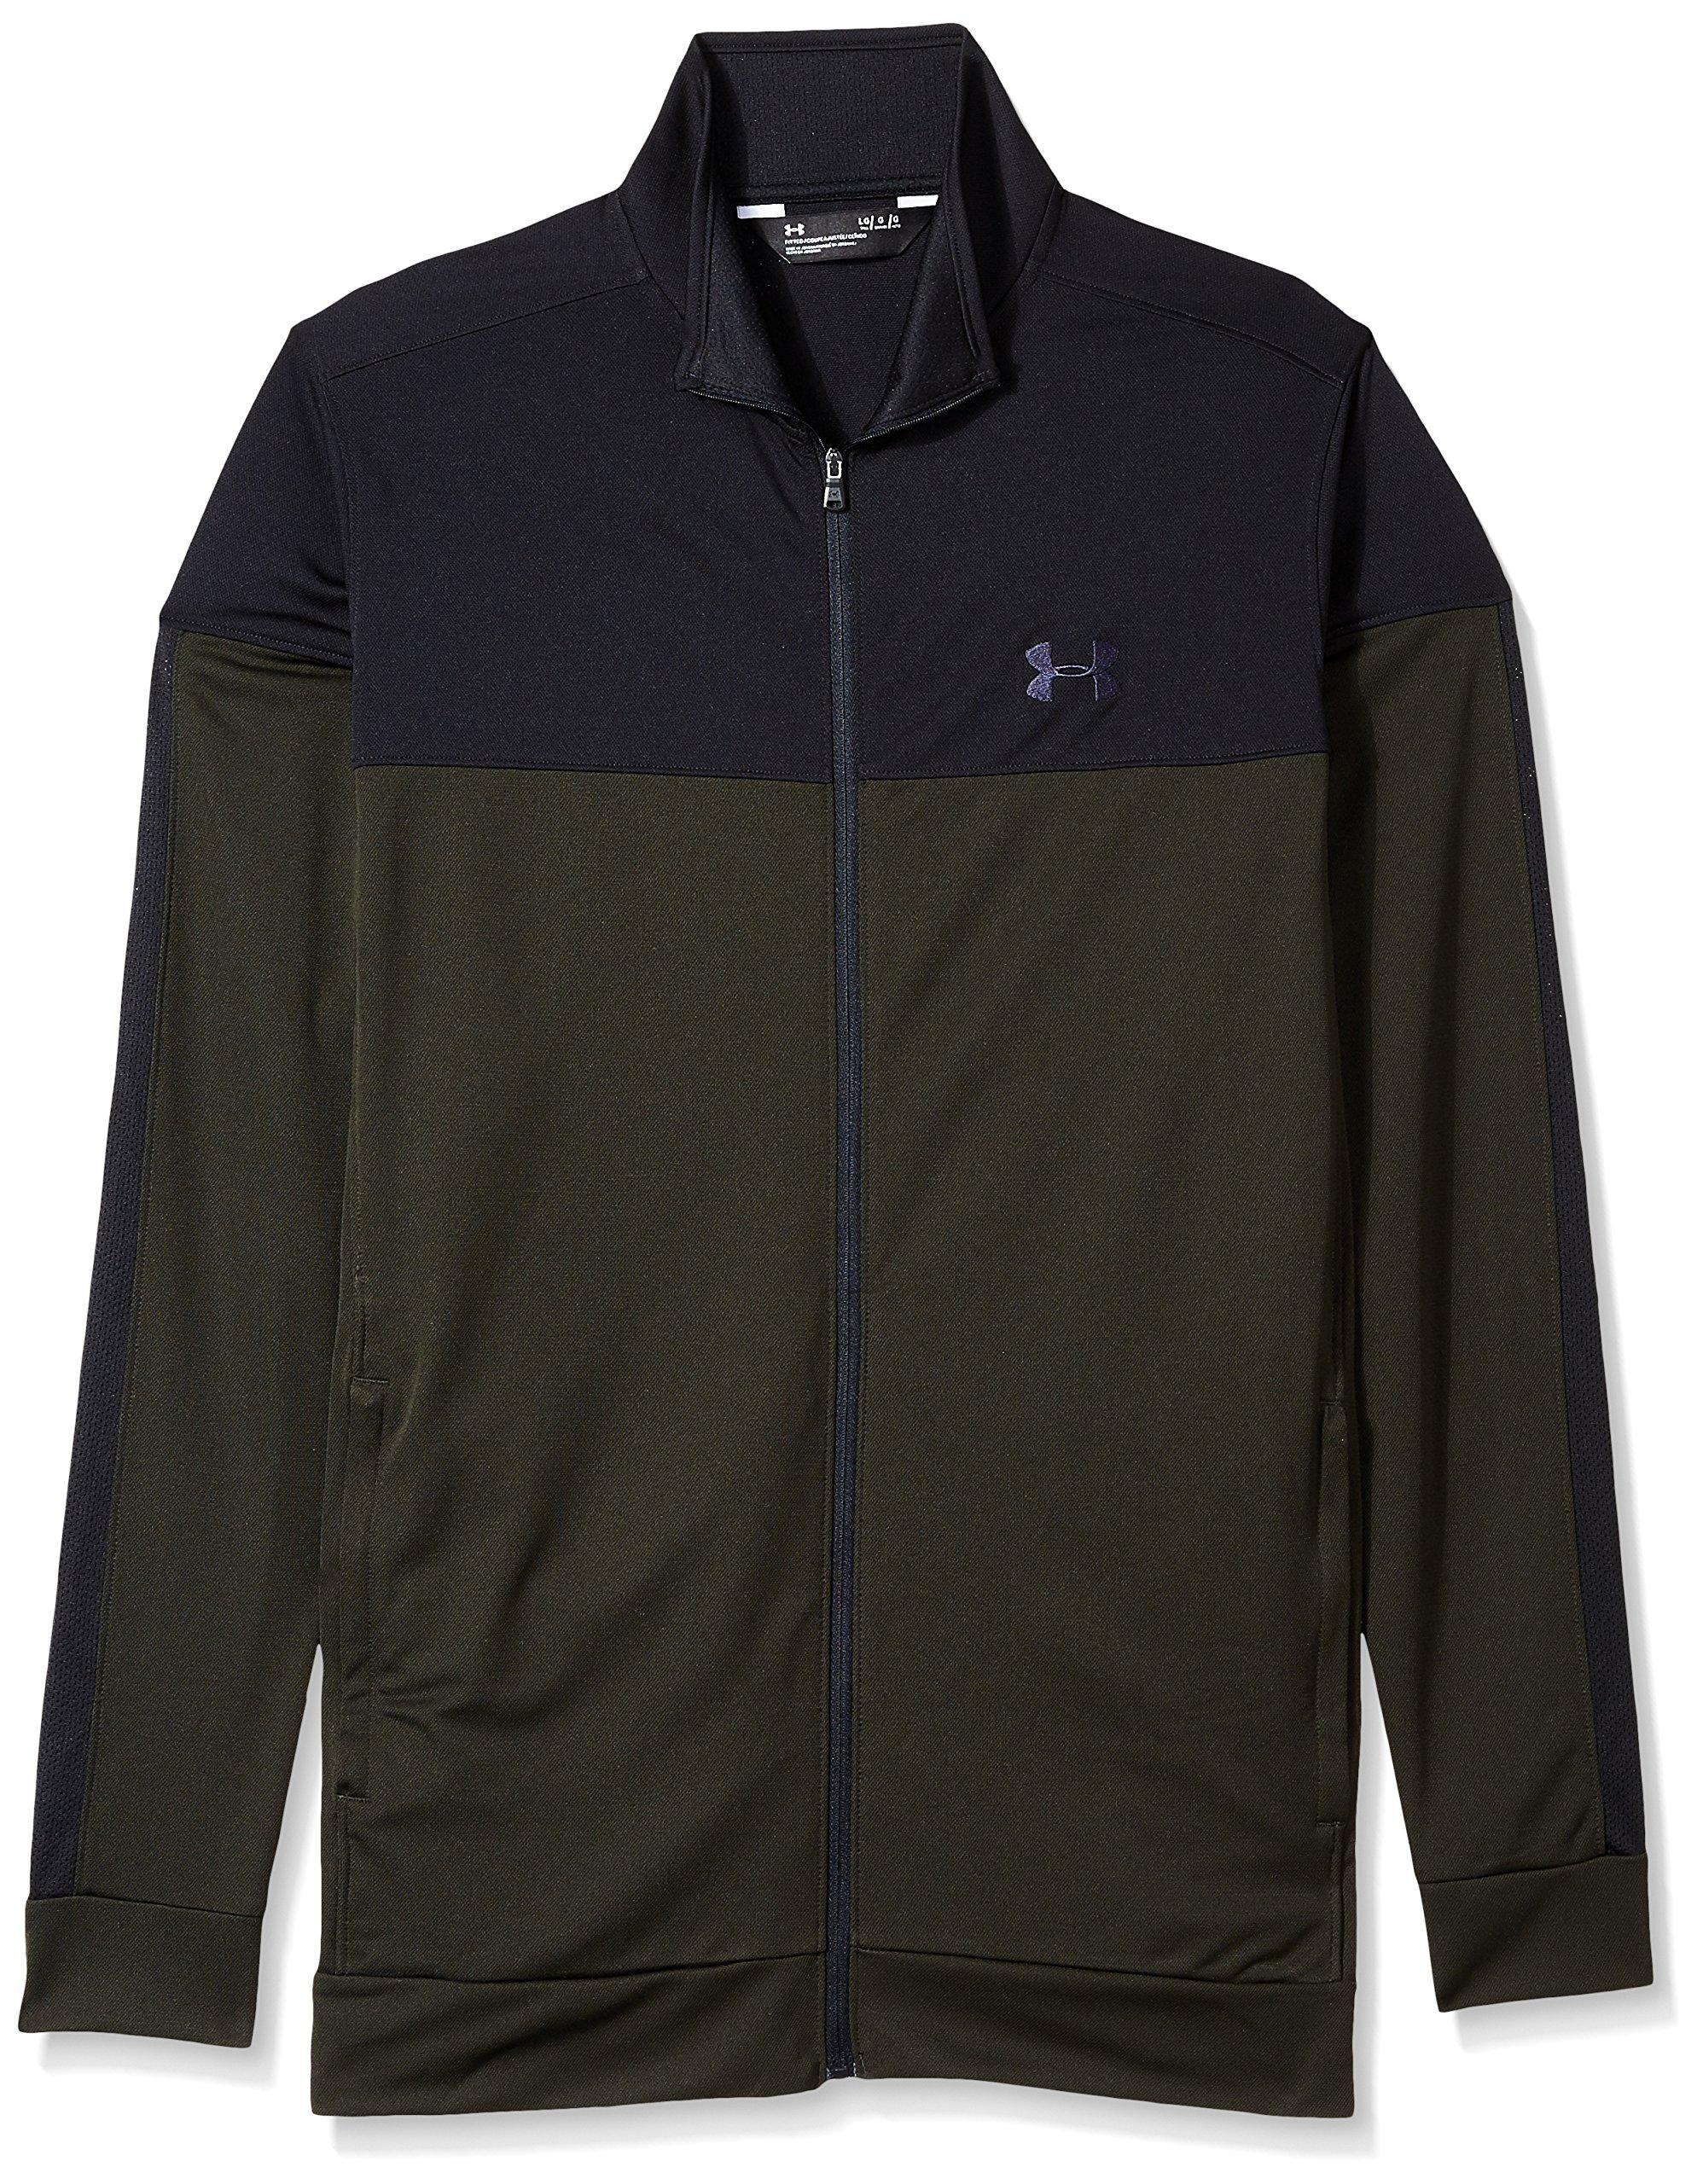 Under Armour Men's Sportstyle Pique Jacket, Artillery Green (357)/Black, Small